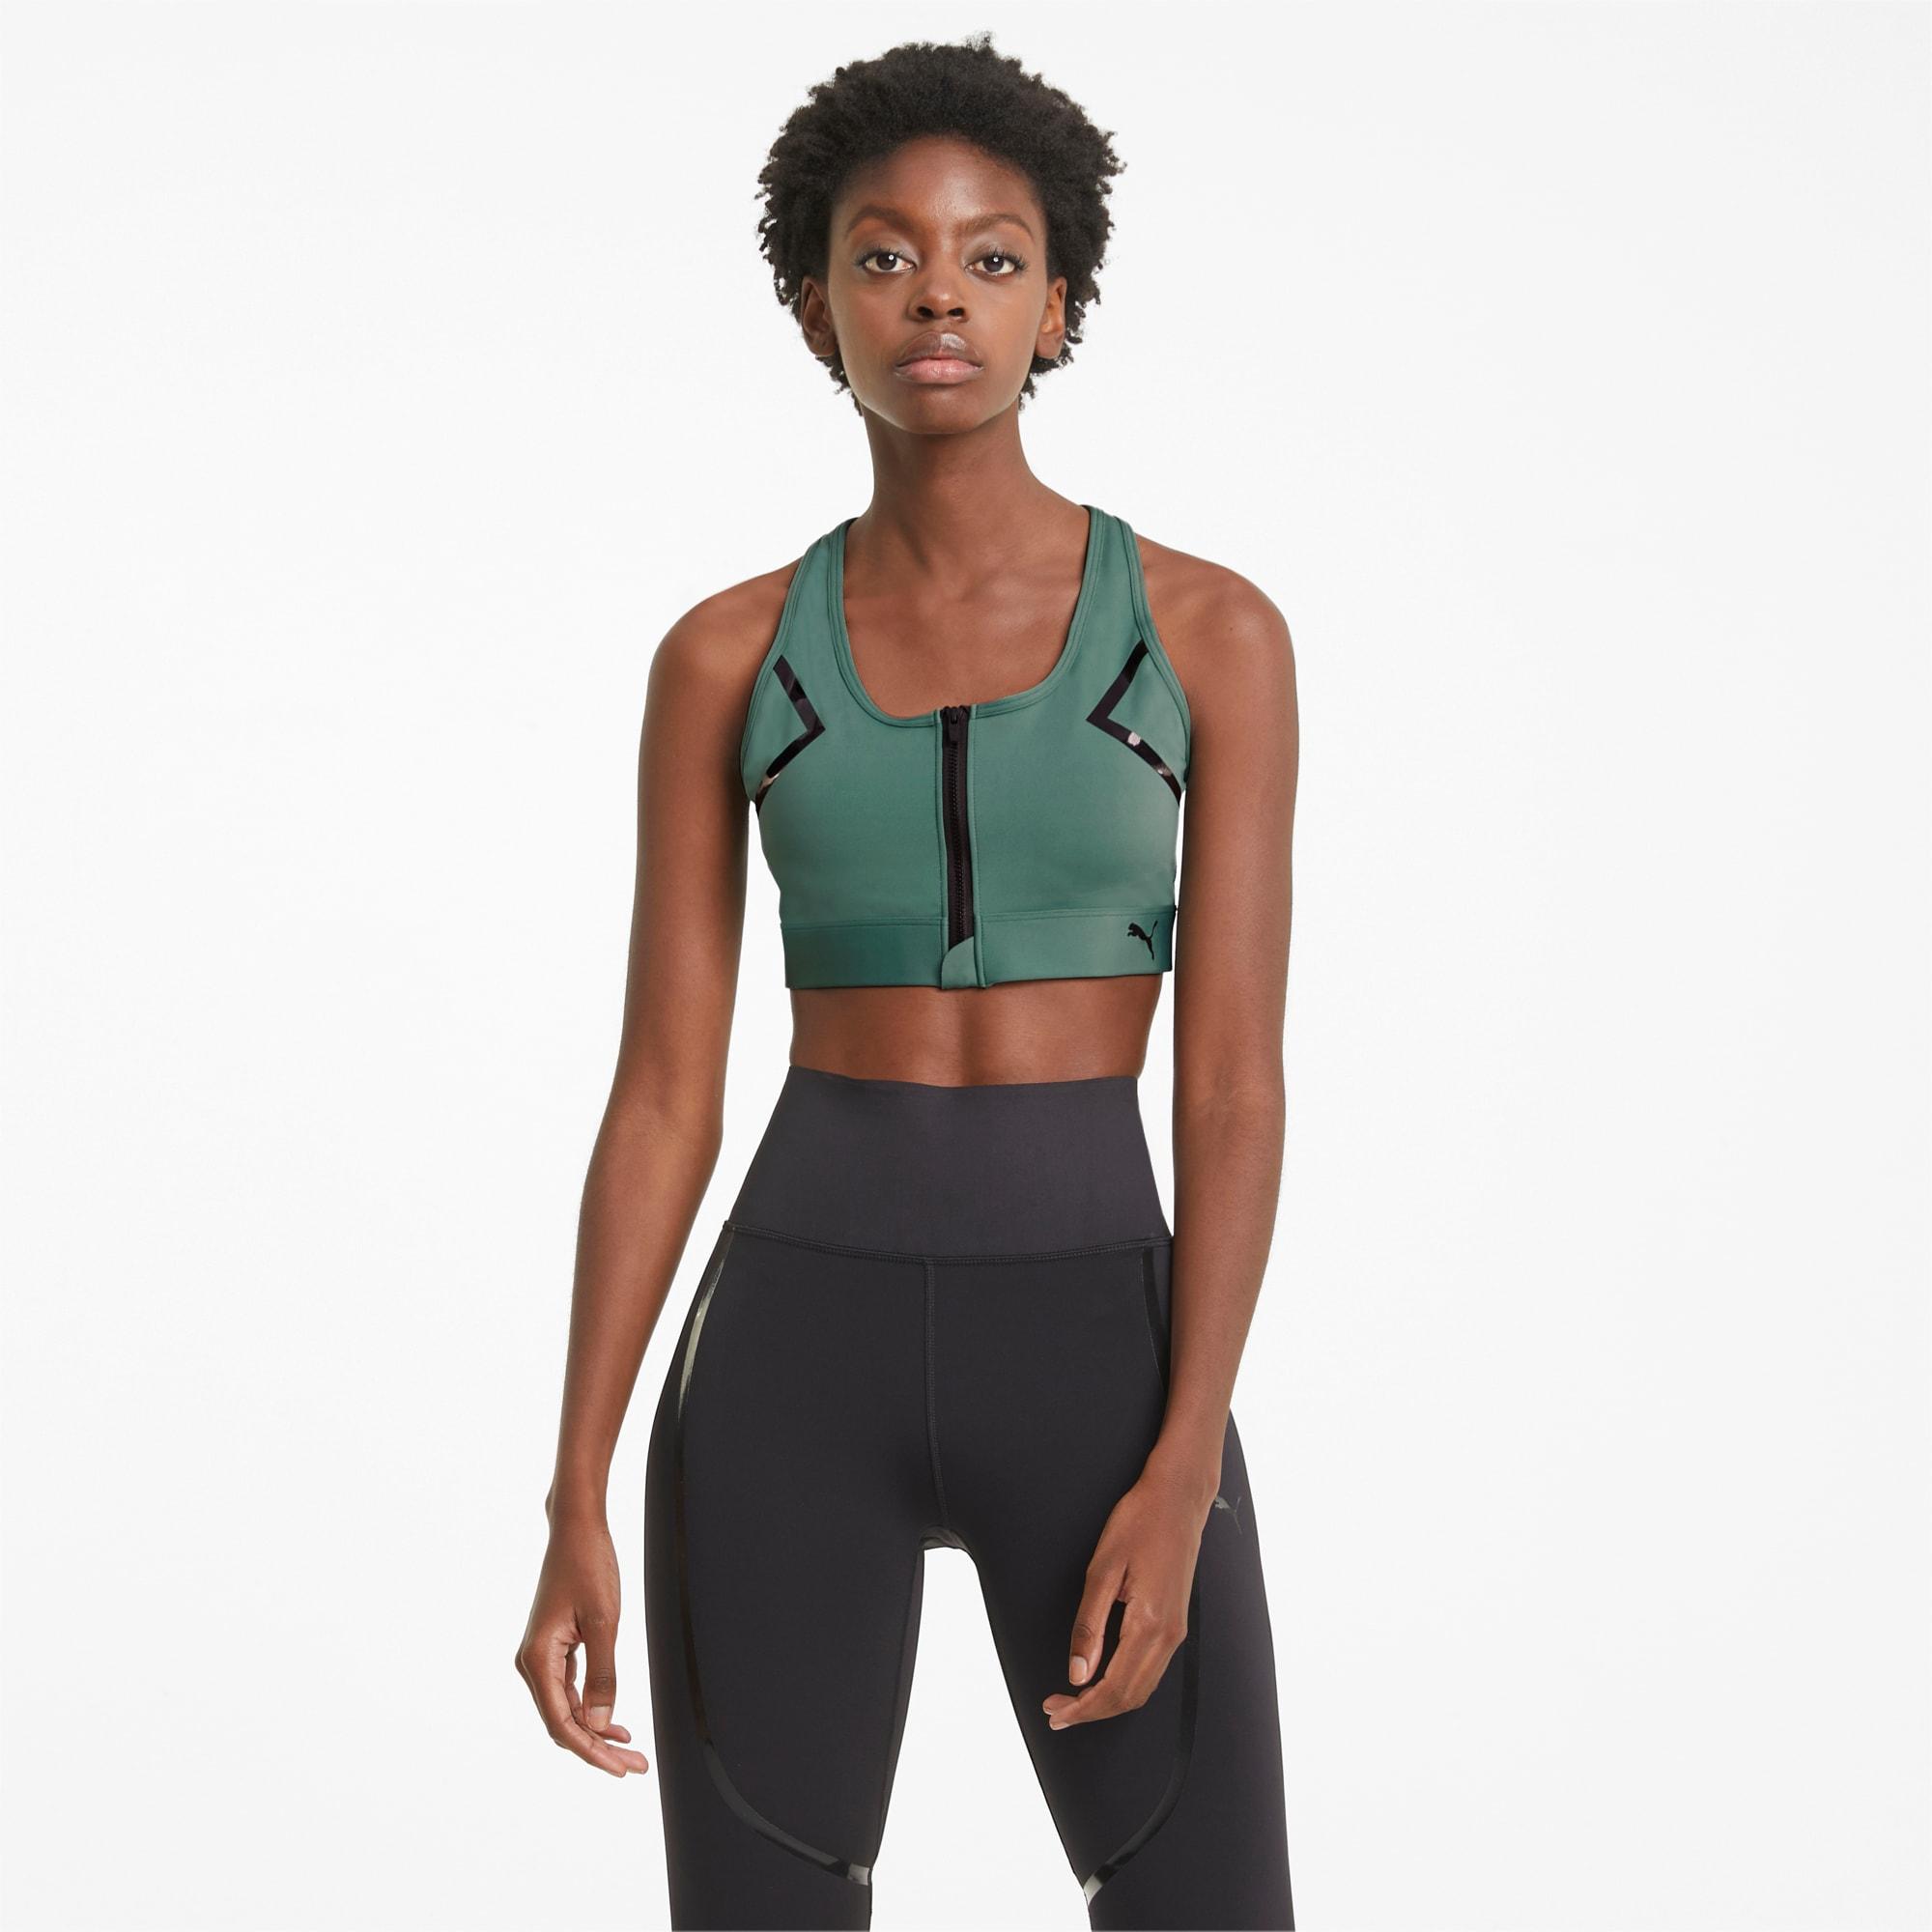 PUMA Front Zip Women's High Impact Bra, Blue Spruce, size X Small, Clothing